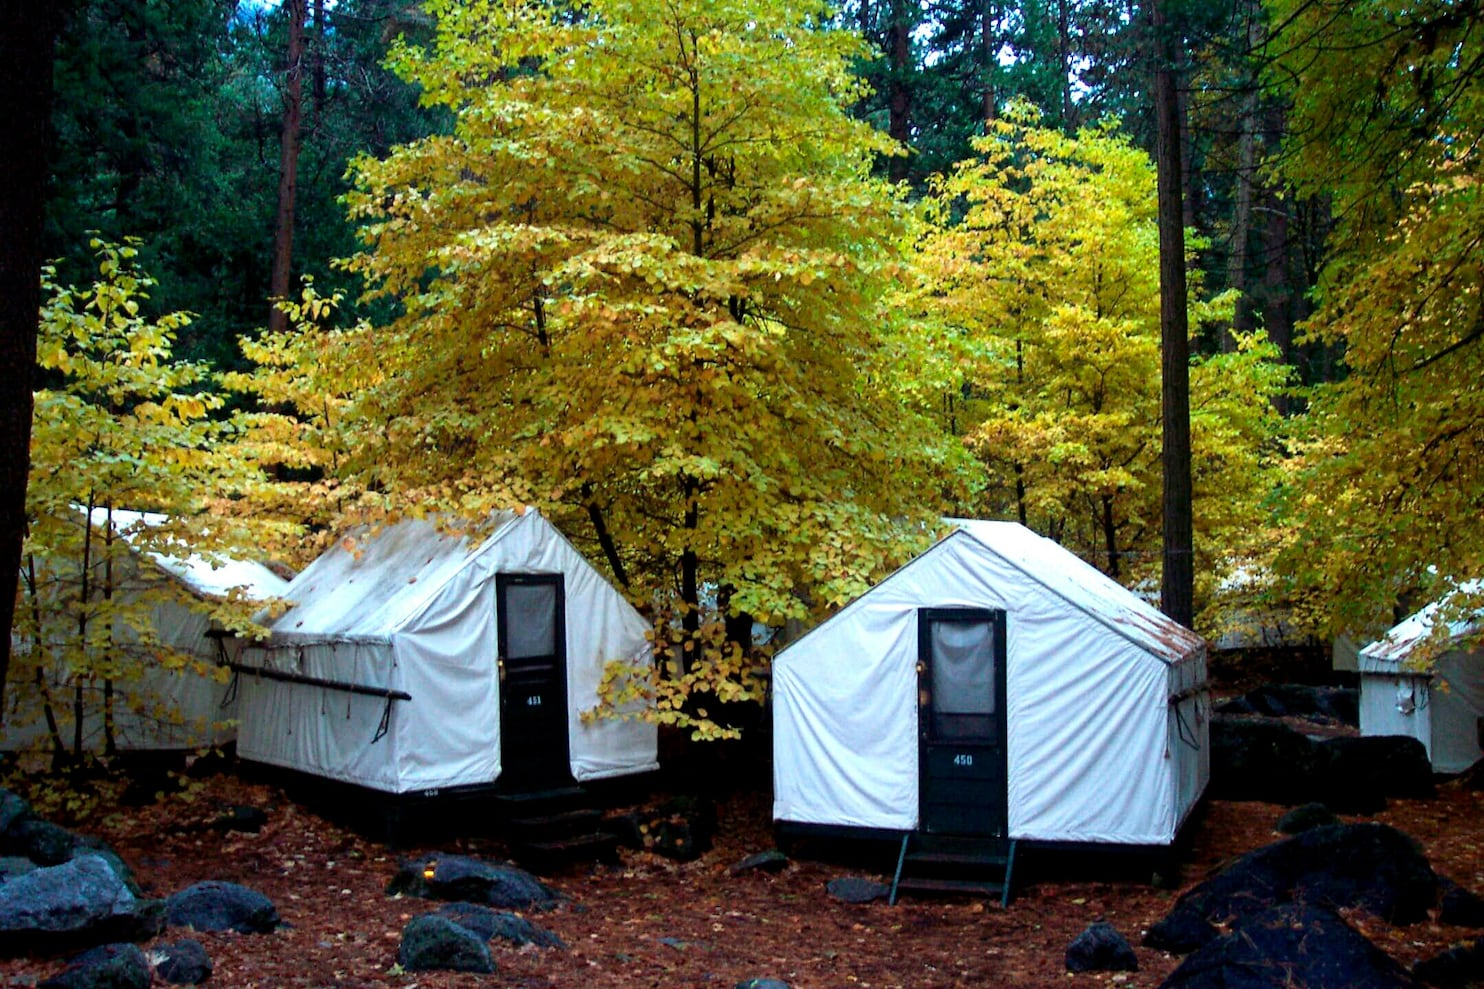 Yosemite tent cabins are locked as hantavirus source is